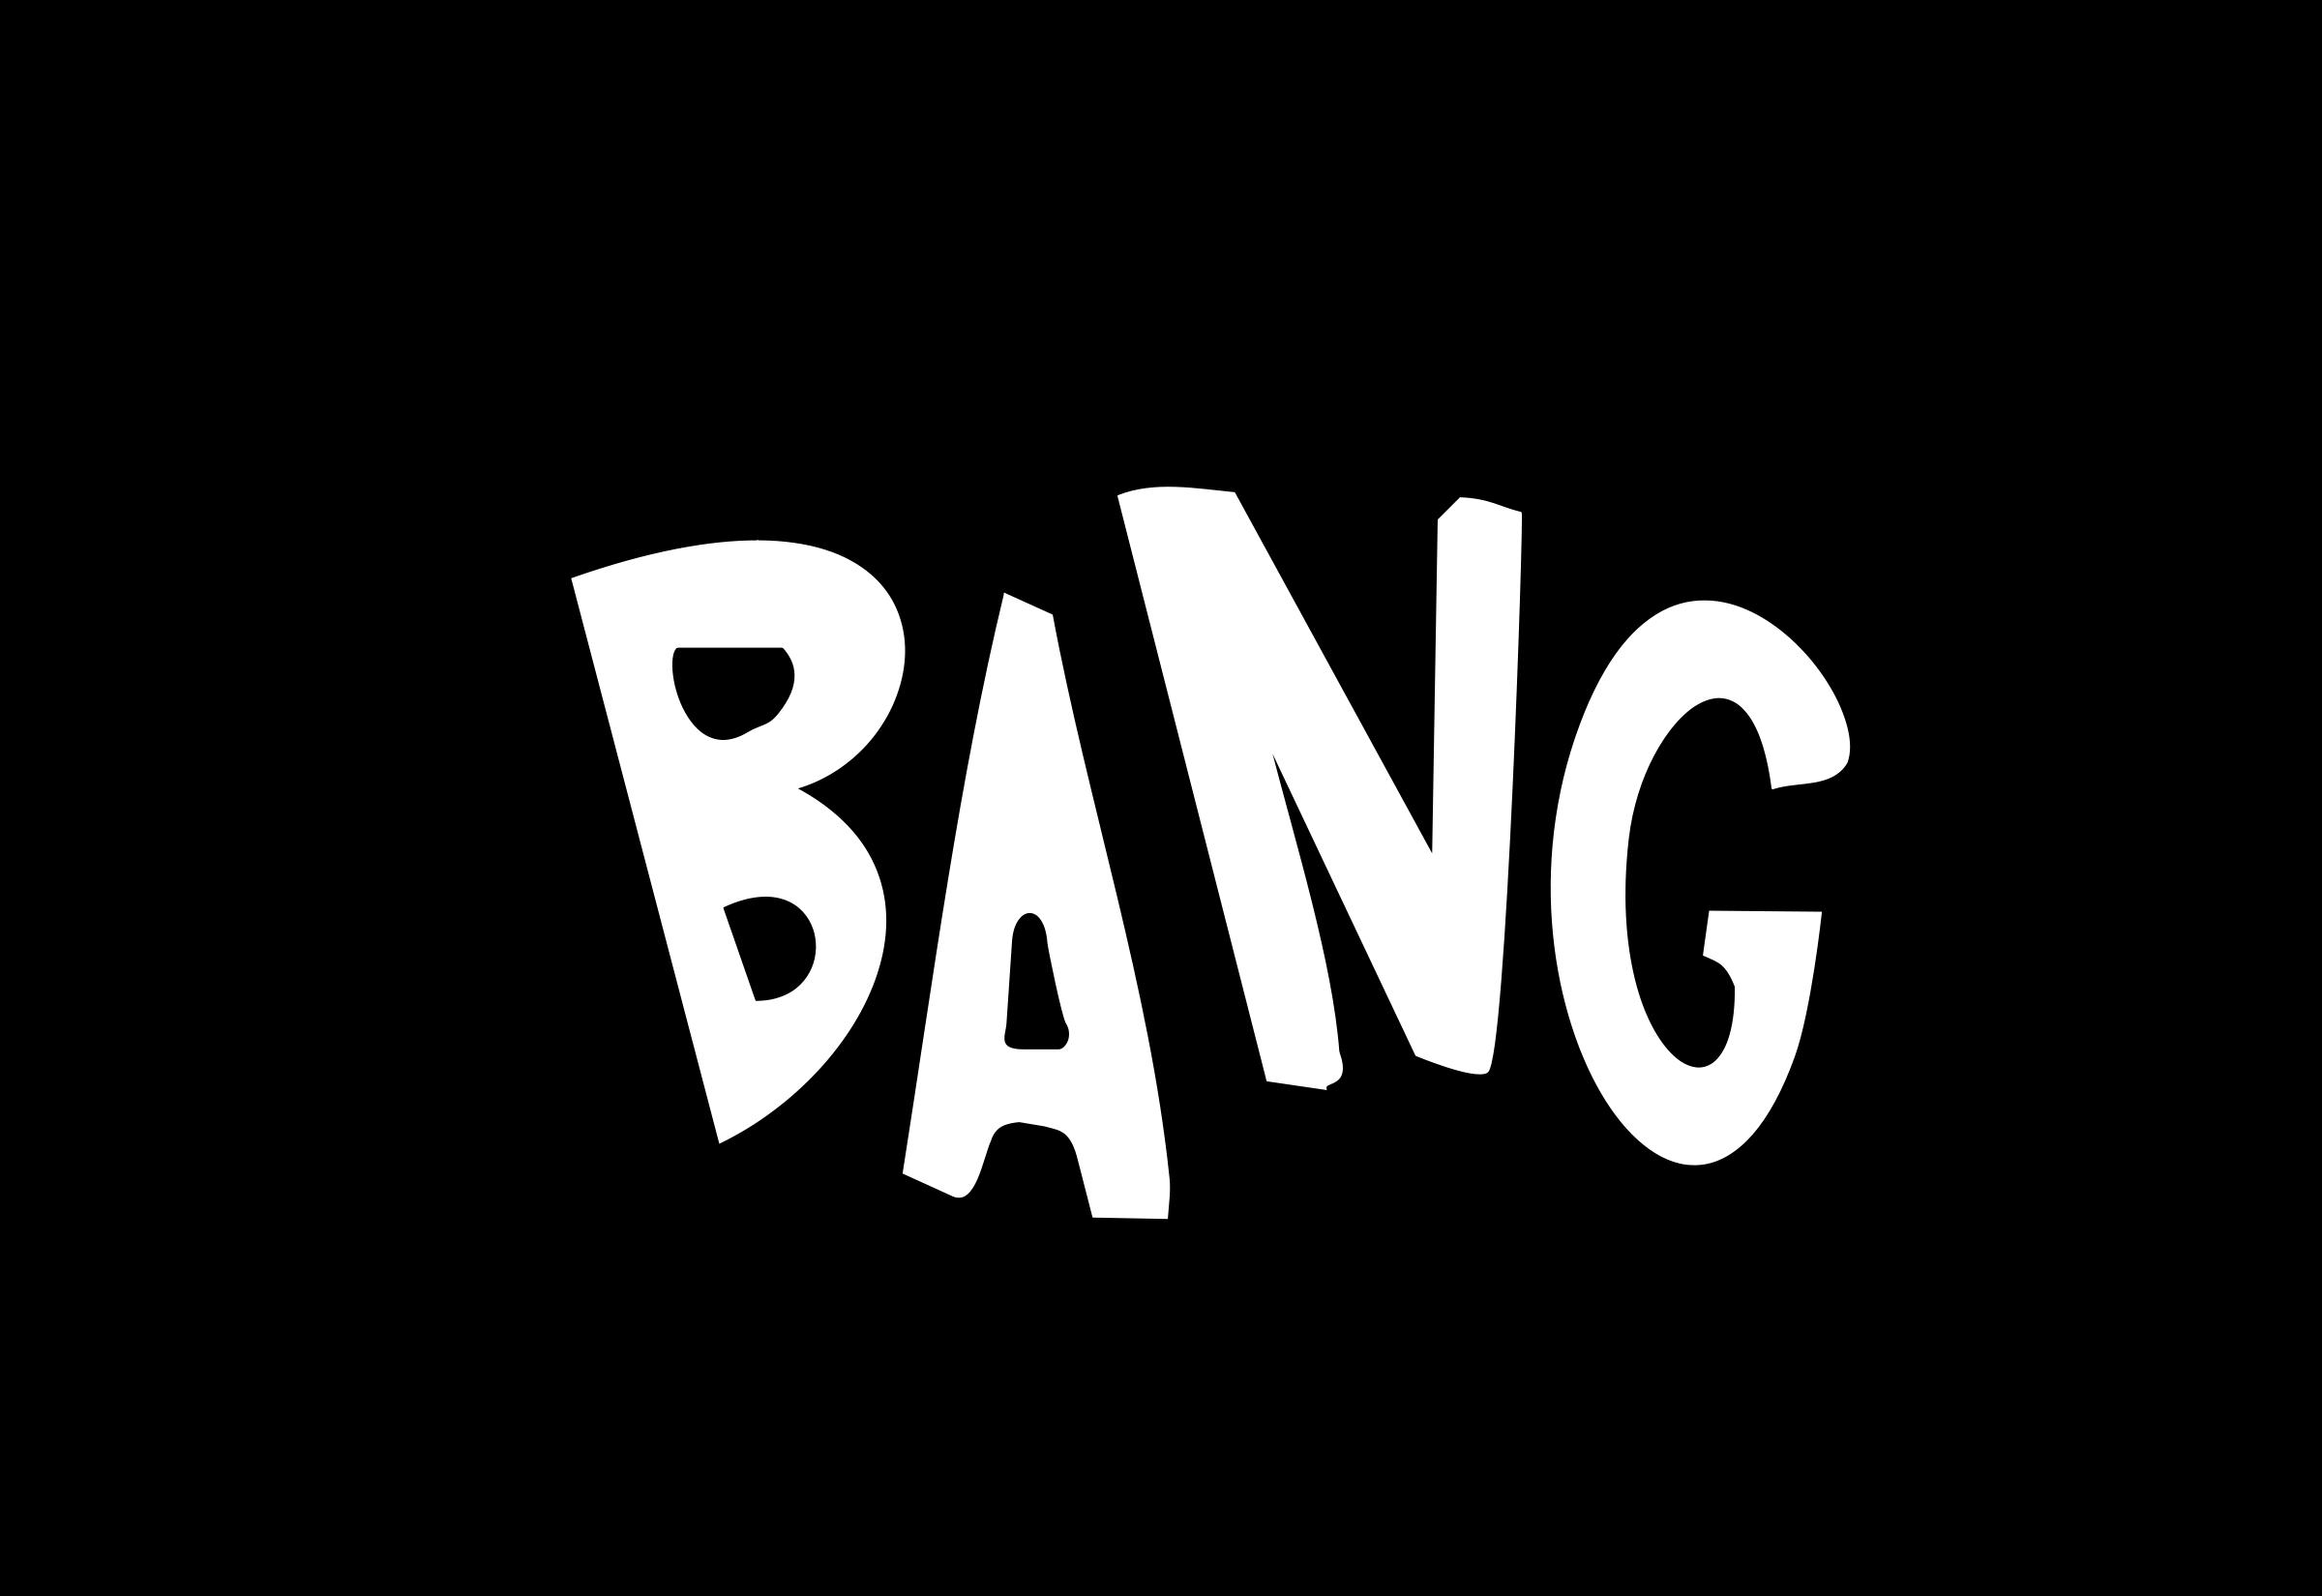 Bang panda free images. Wow clipart superhero